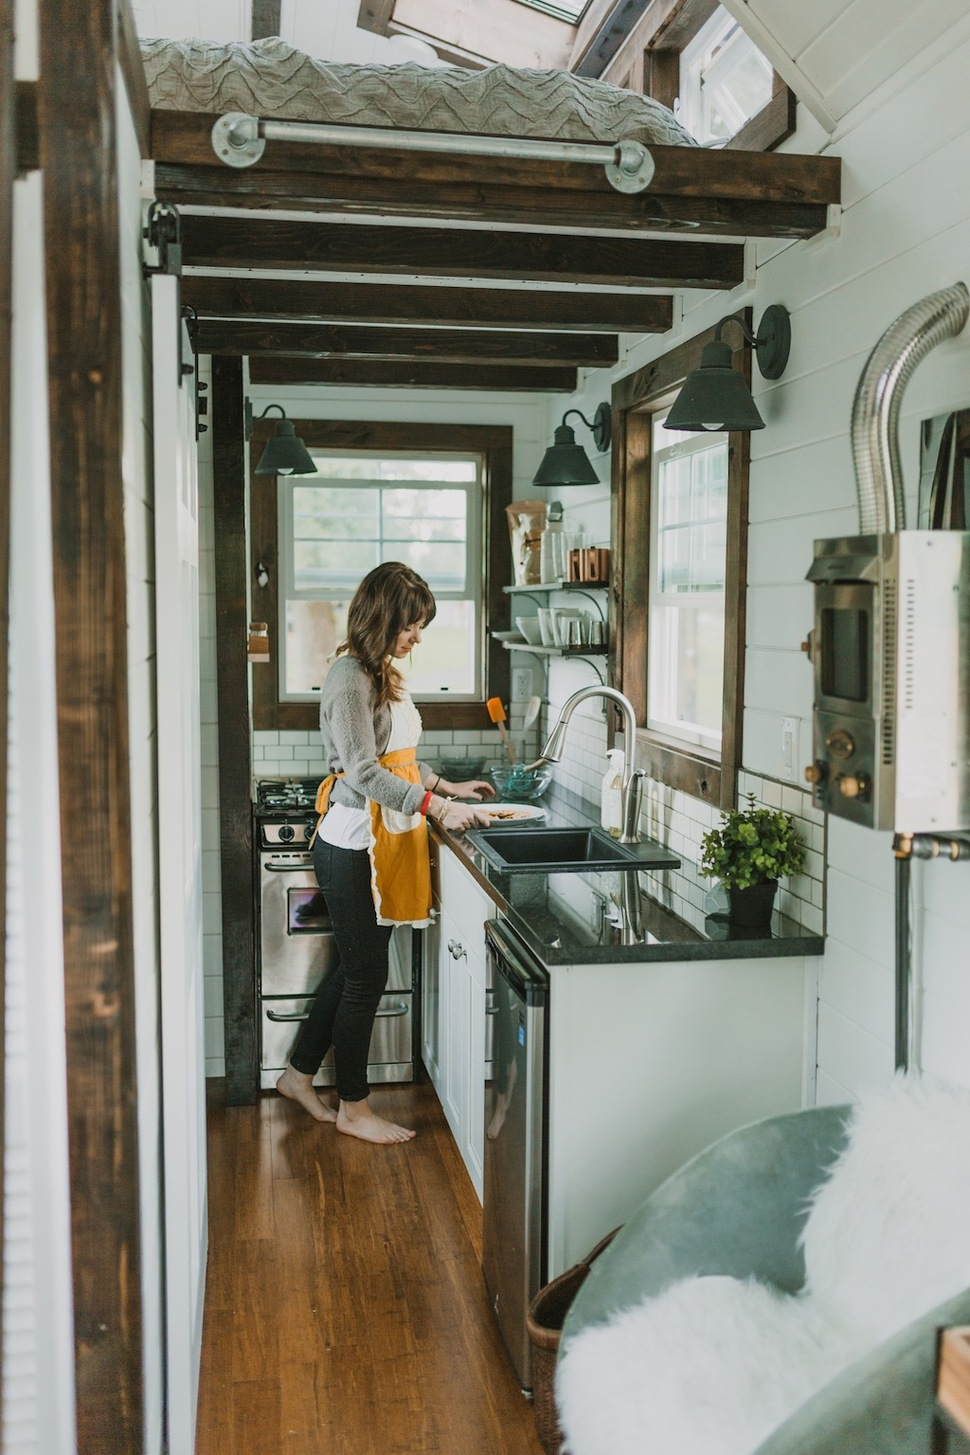 Casa con ruedas con un interior muy sorprendente - Fotos de casas de madera por dentro ...